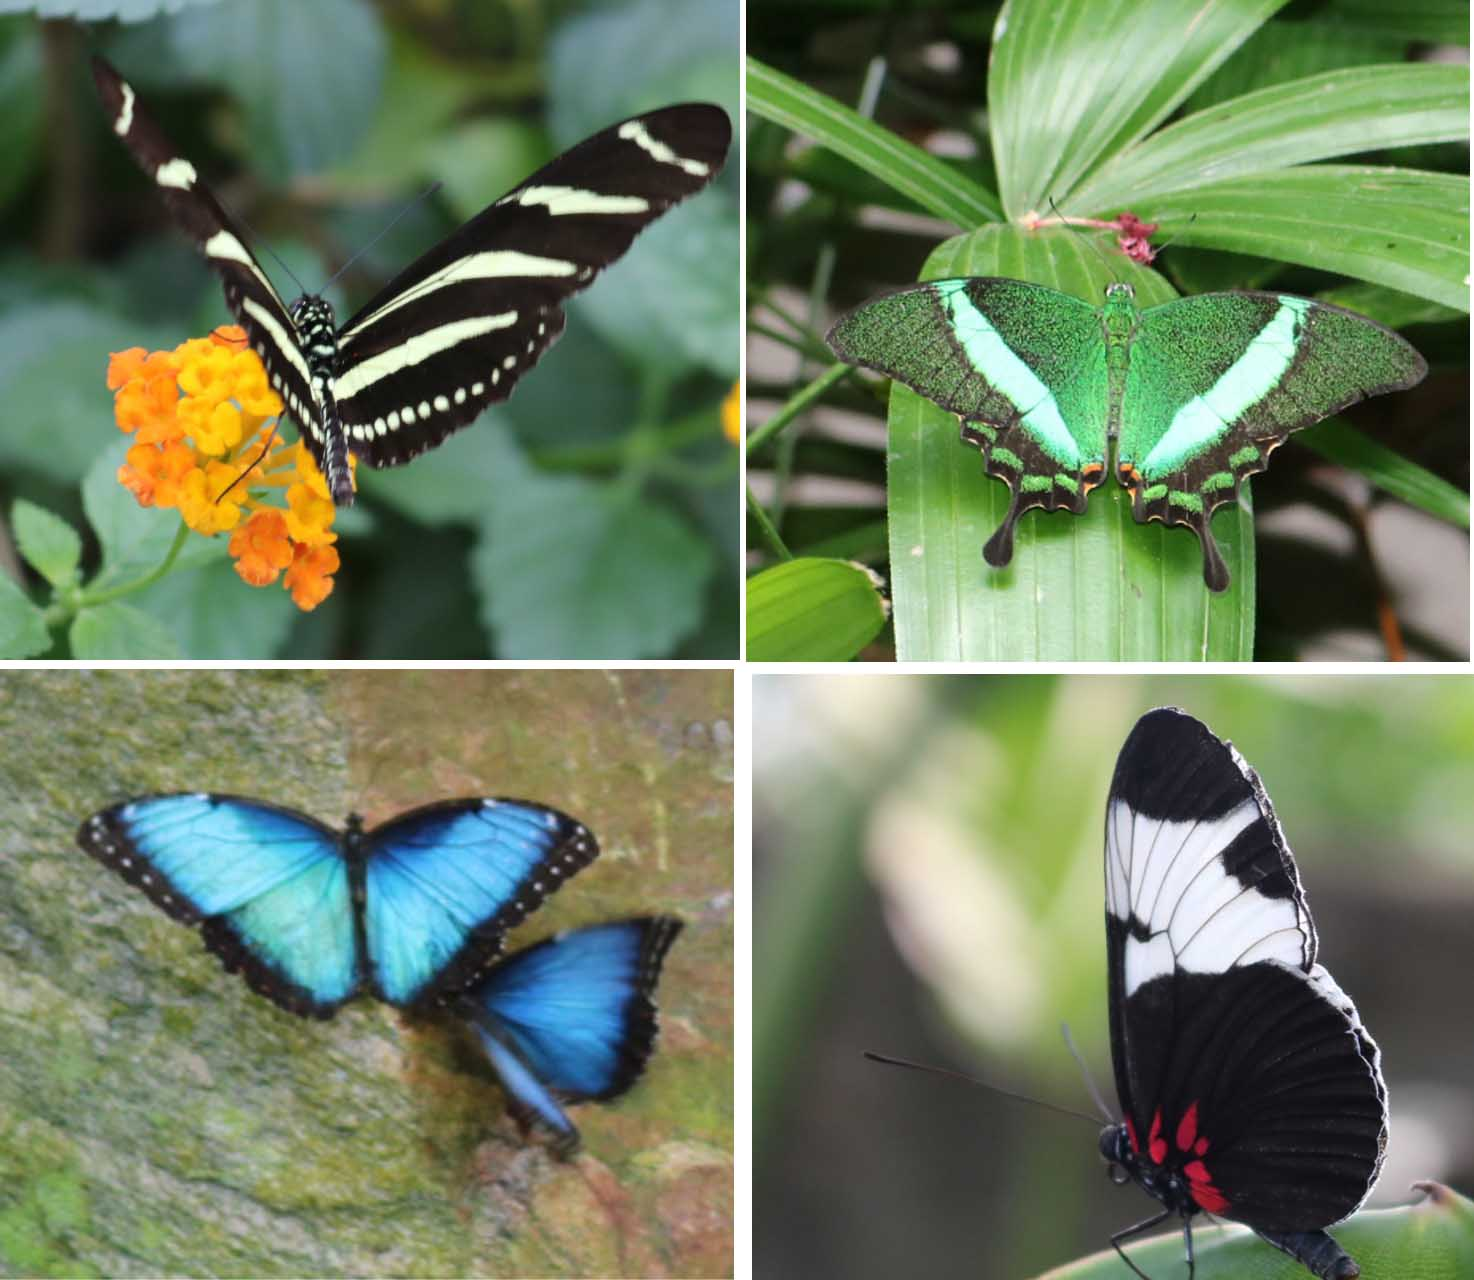 butterfly conservatory niagara falls rejinces. Black Bedroom Furniture Sets. Home Design Ideas